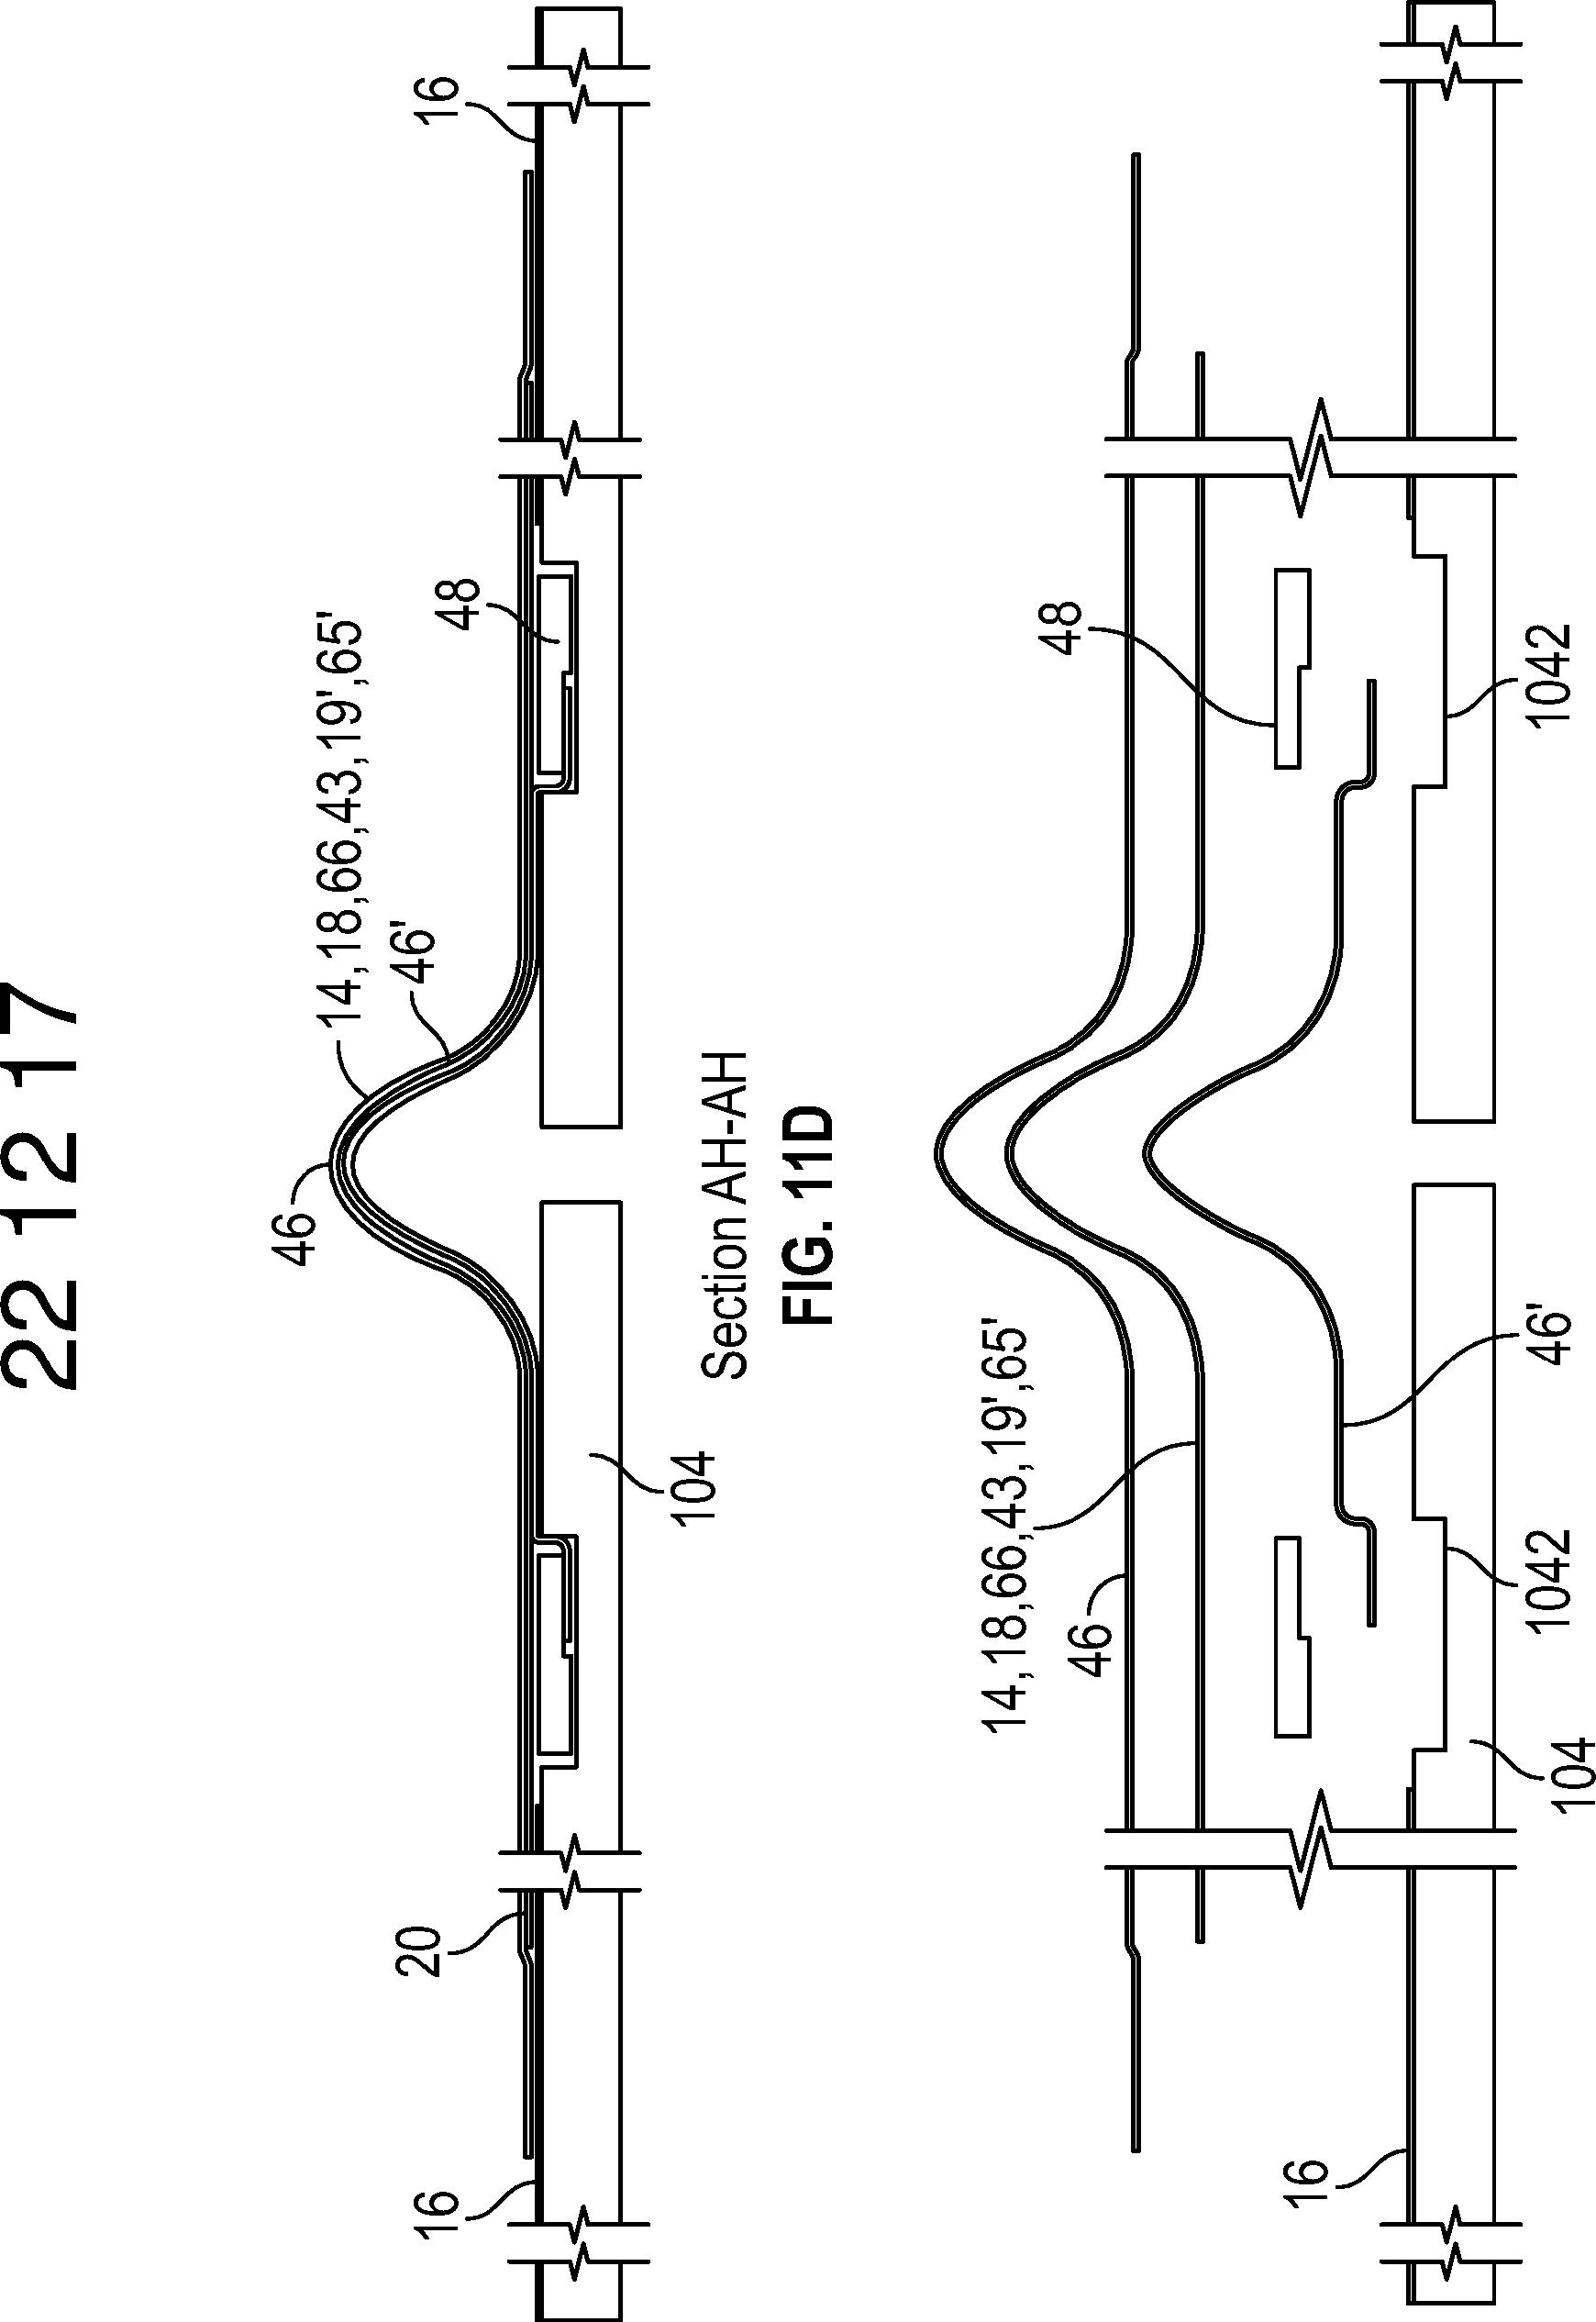 Figure GB2554862A_D0035